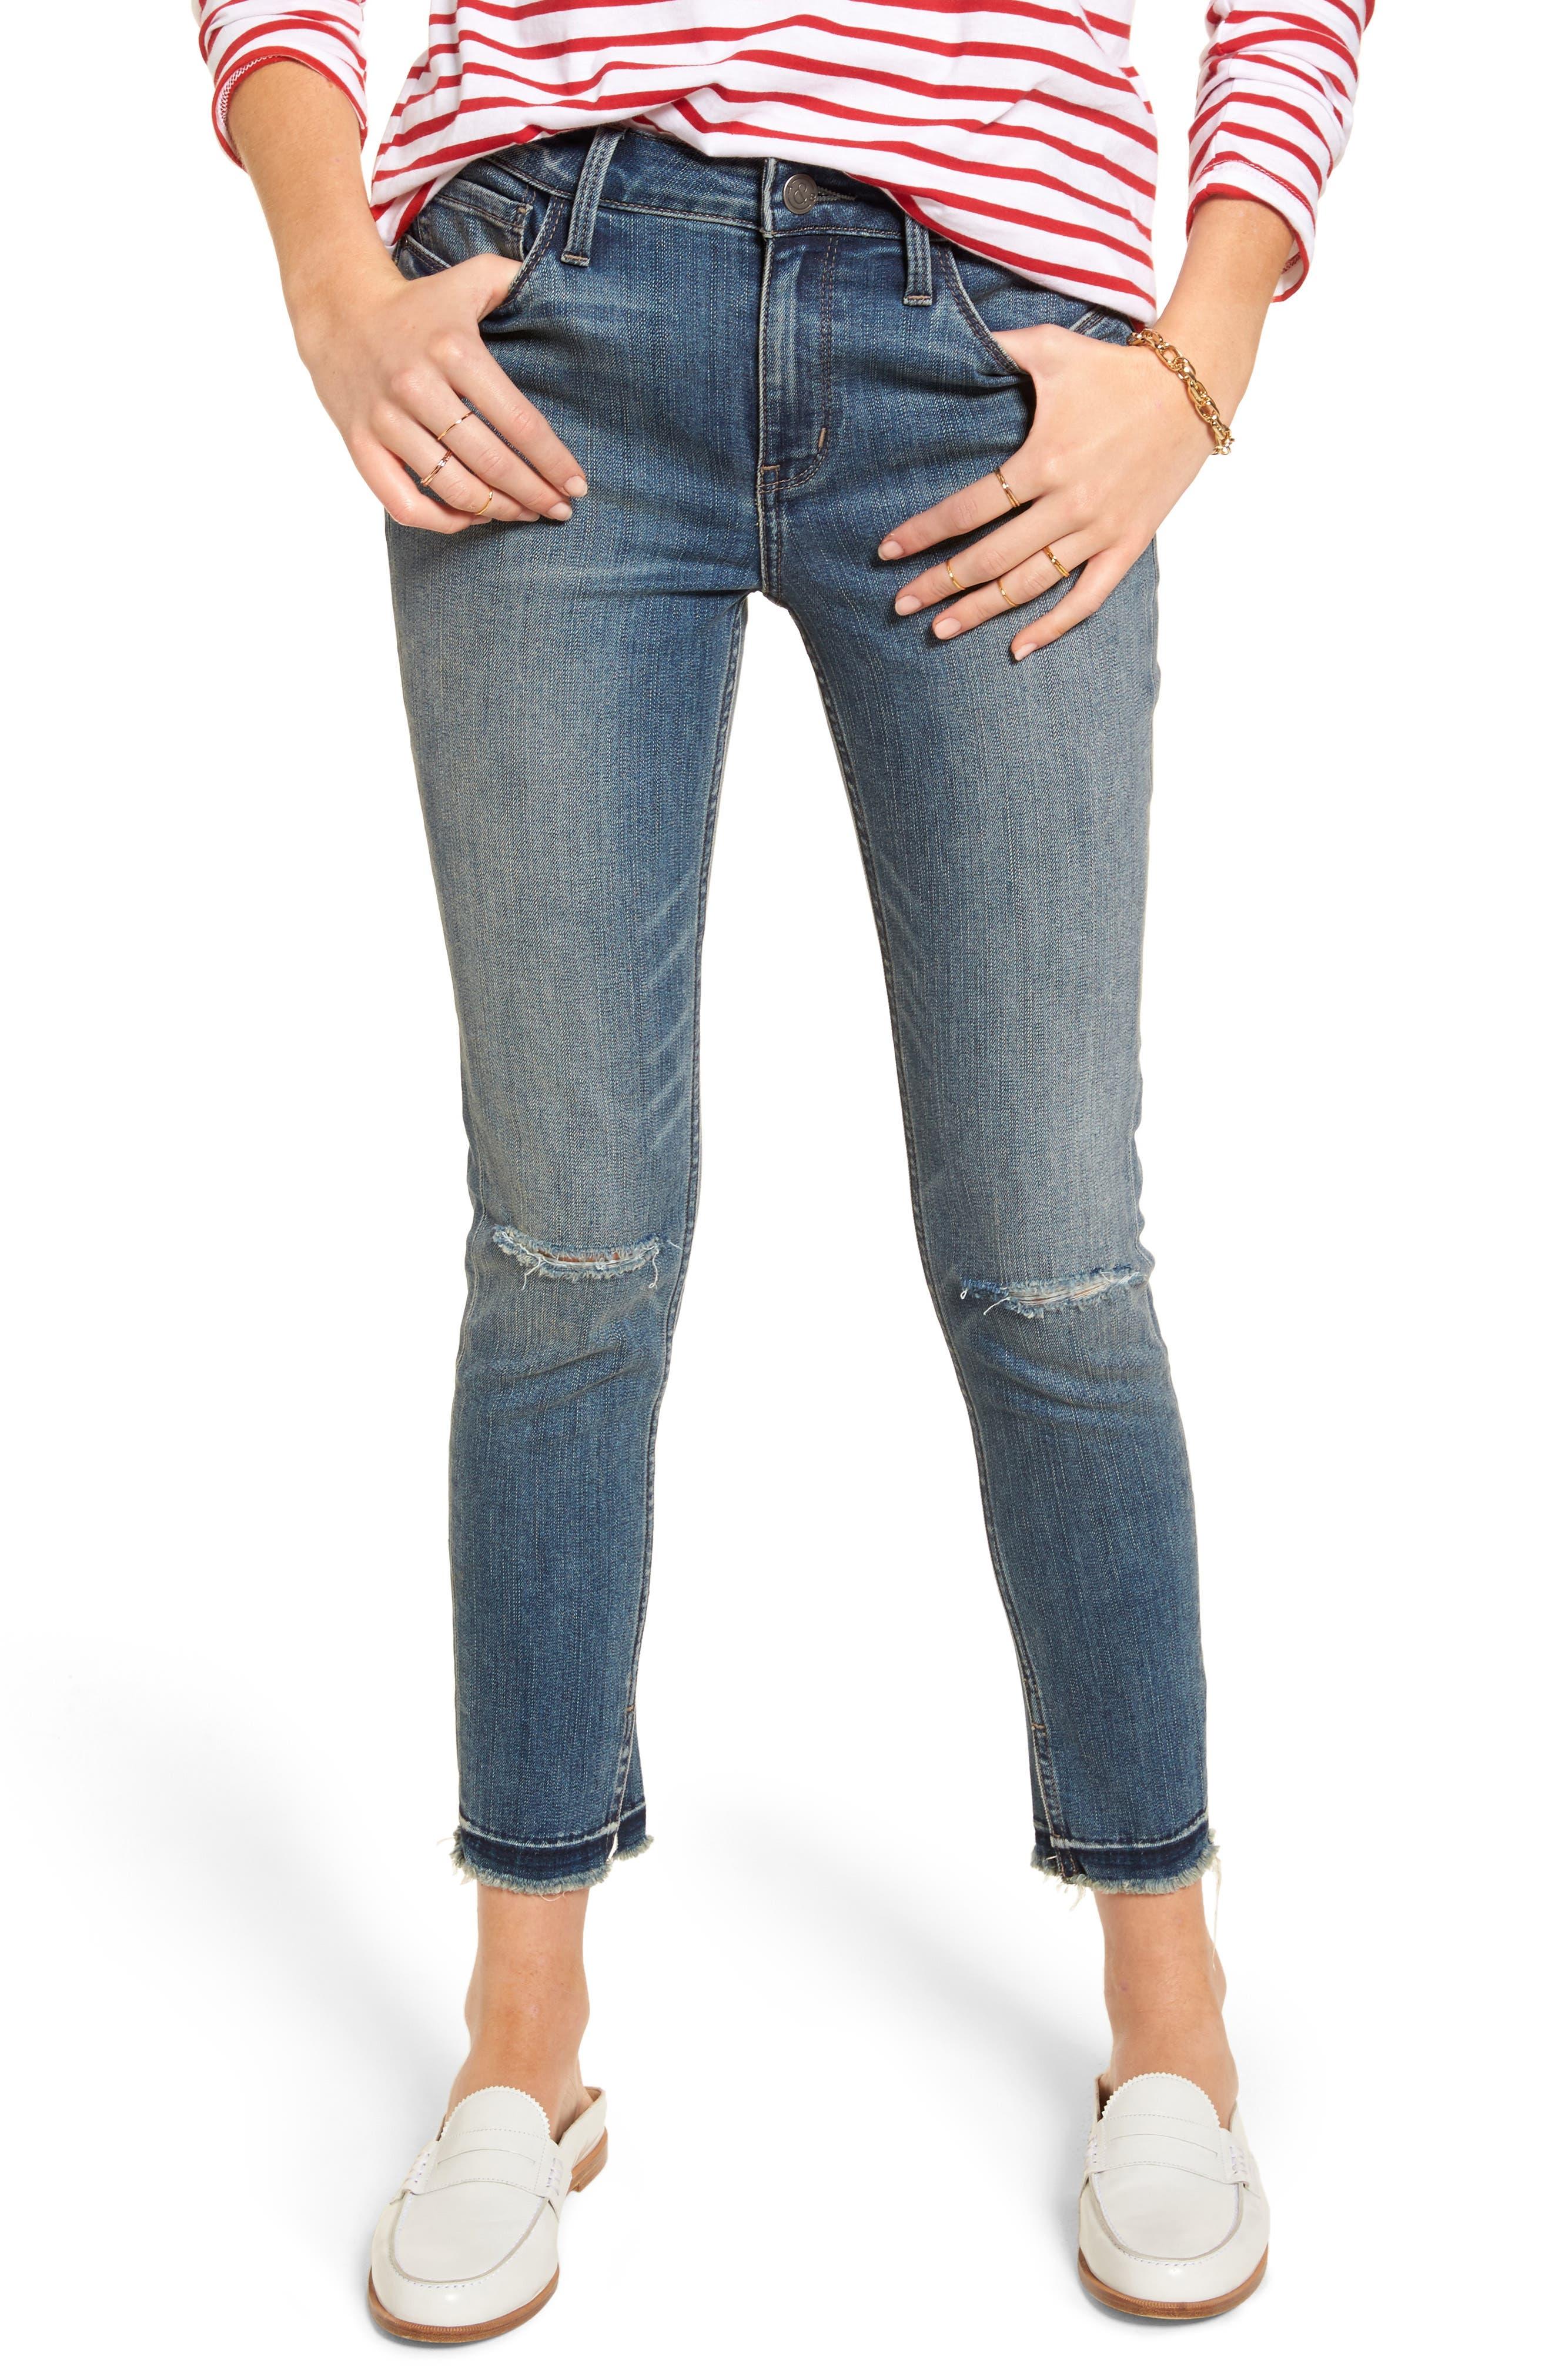 Treasure & Bond Ankle Skinny Jeans (Rain Dusk Destroy)